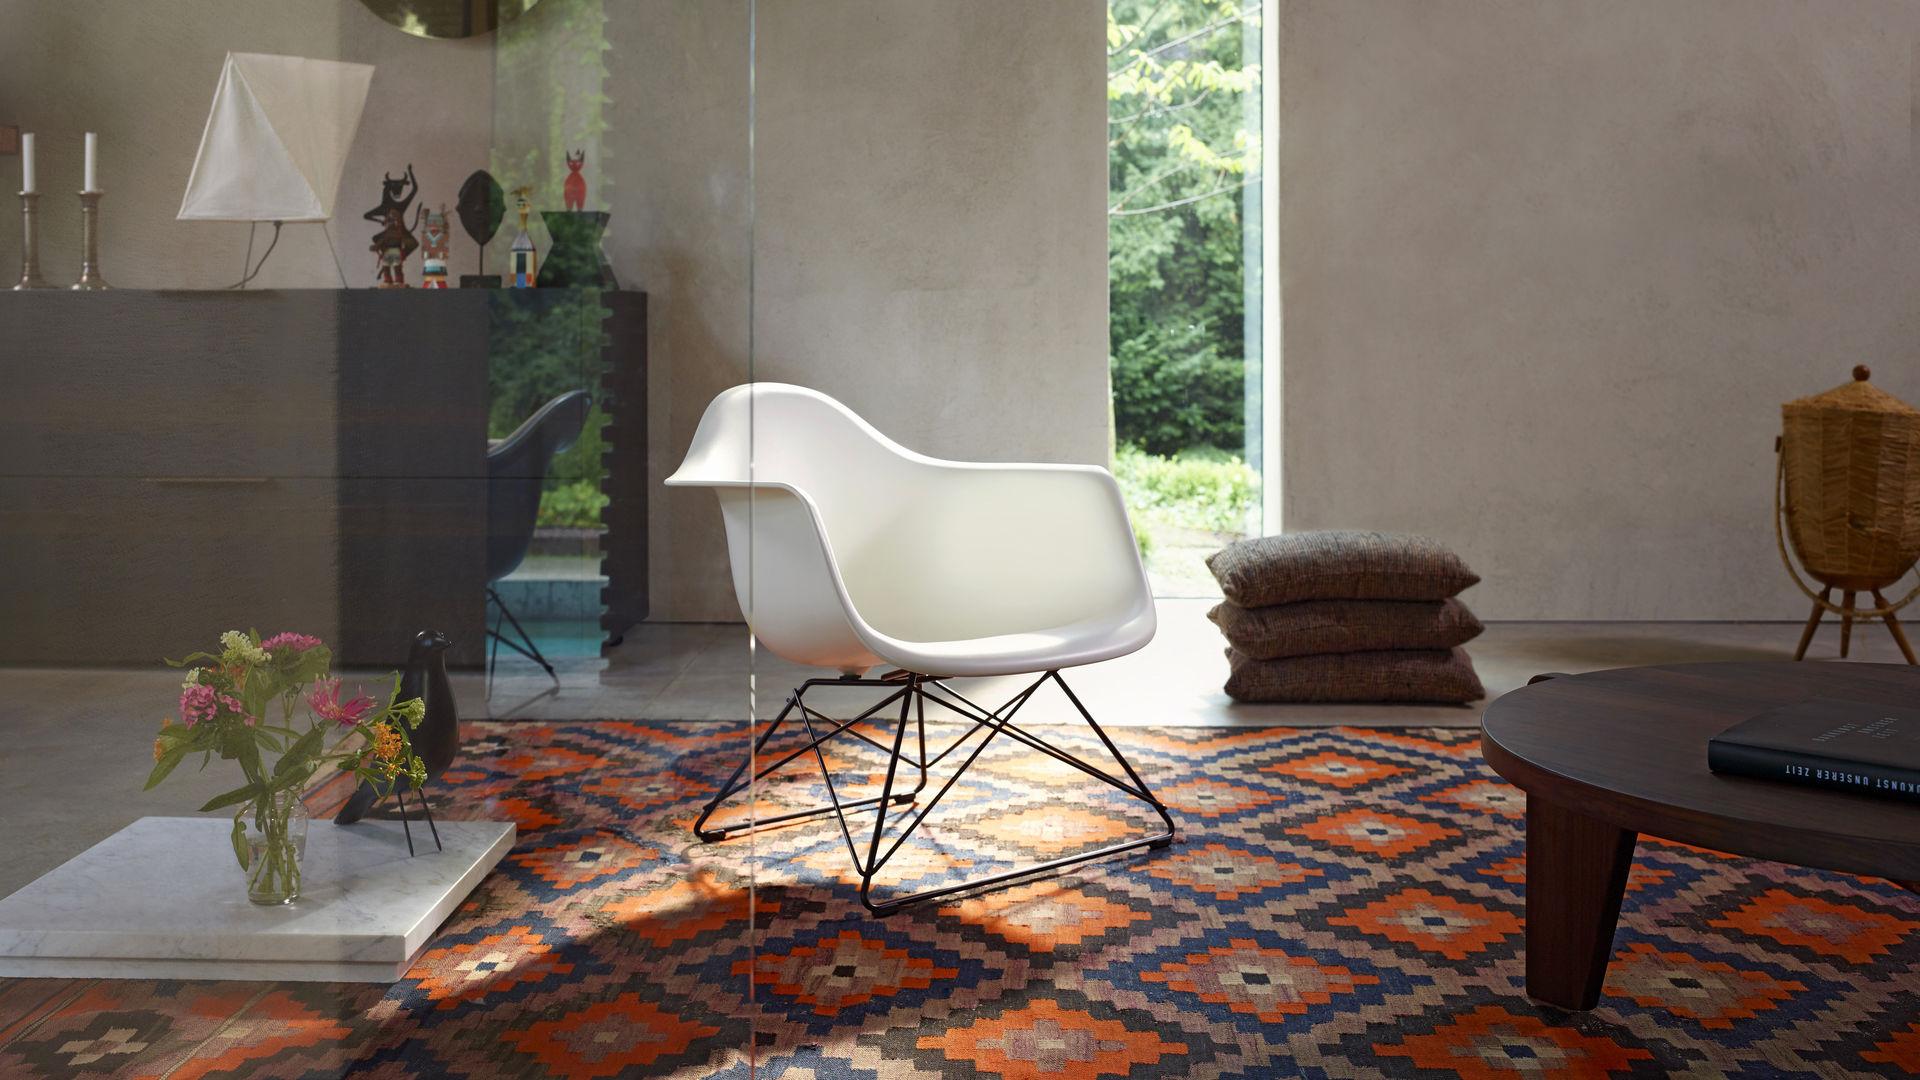 Eames Plastic Armchair LAR and Guéridon Bas_web_16-9